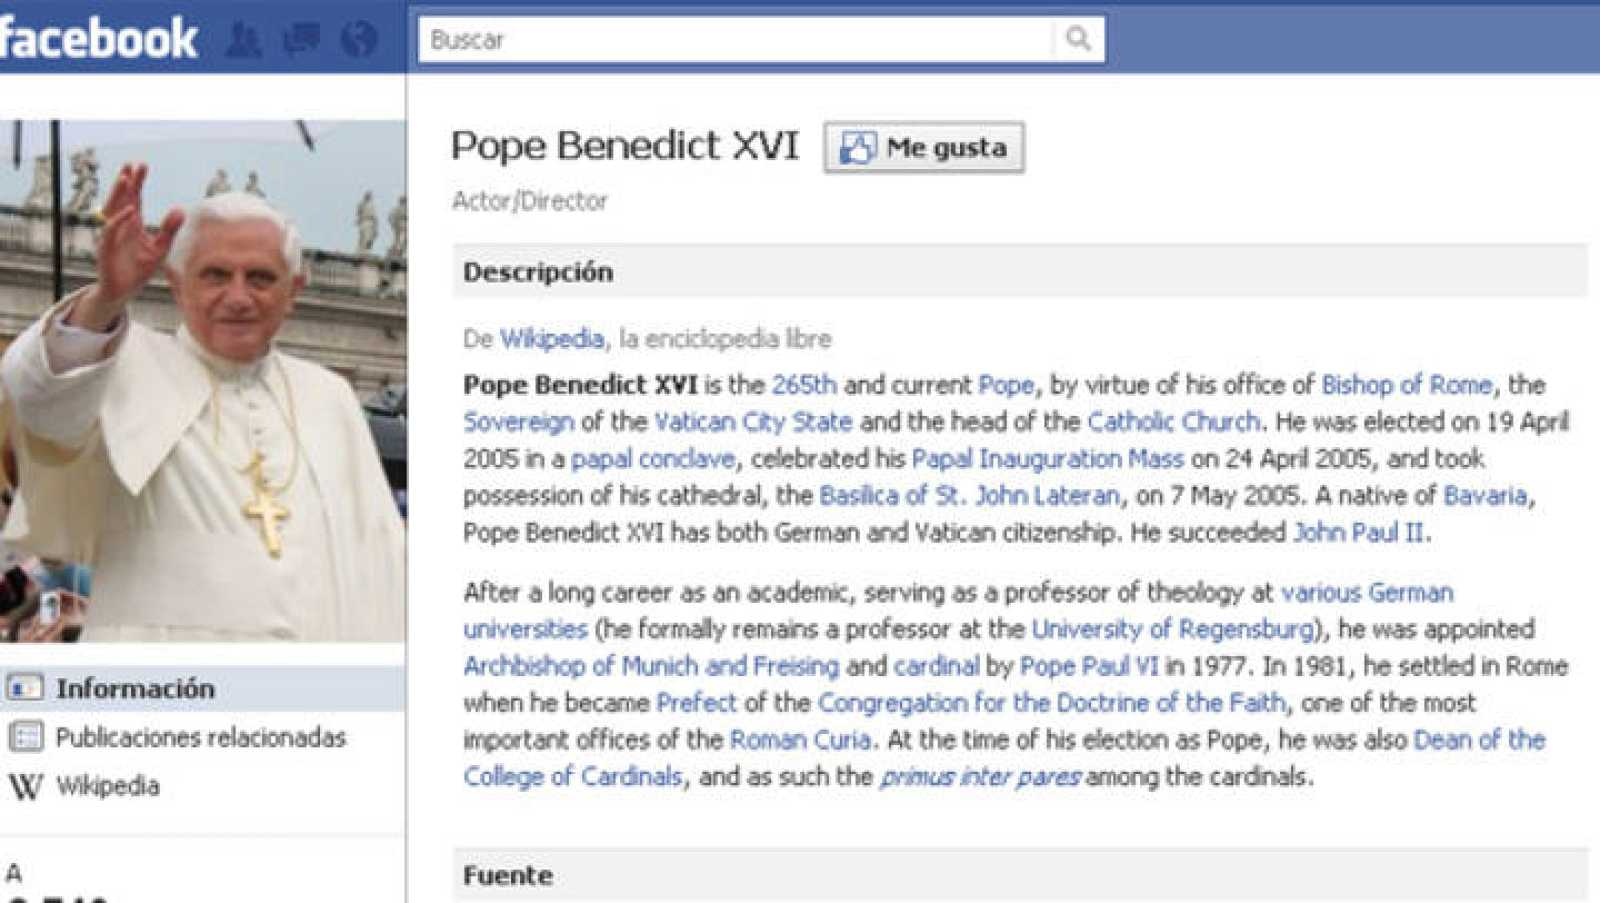 Imagen del perfil de Facebook del Papa.